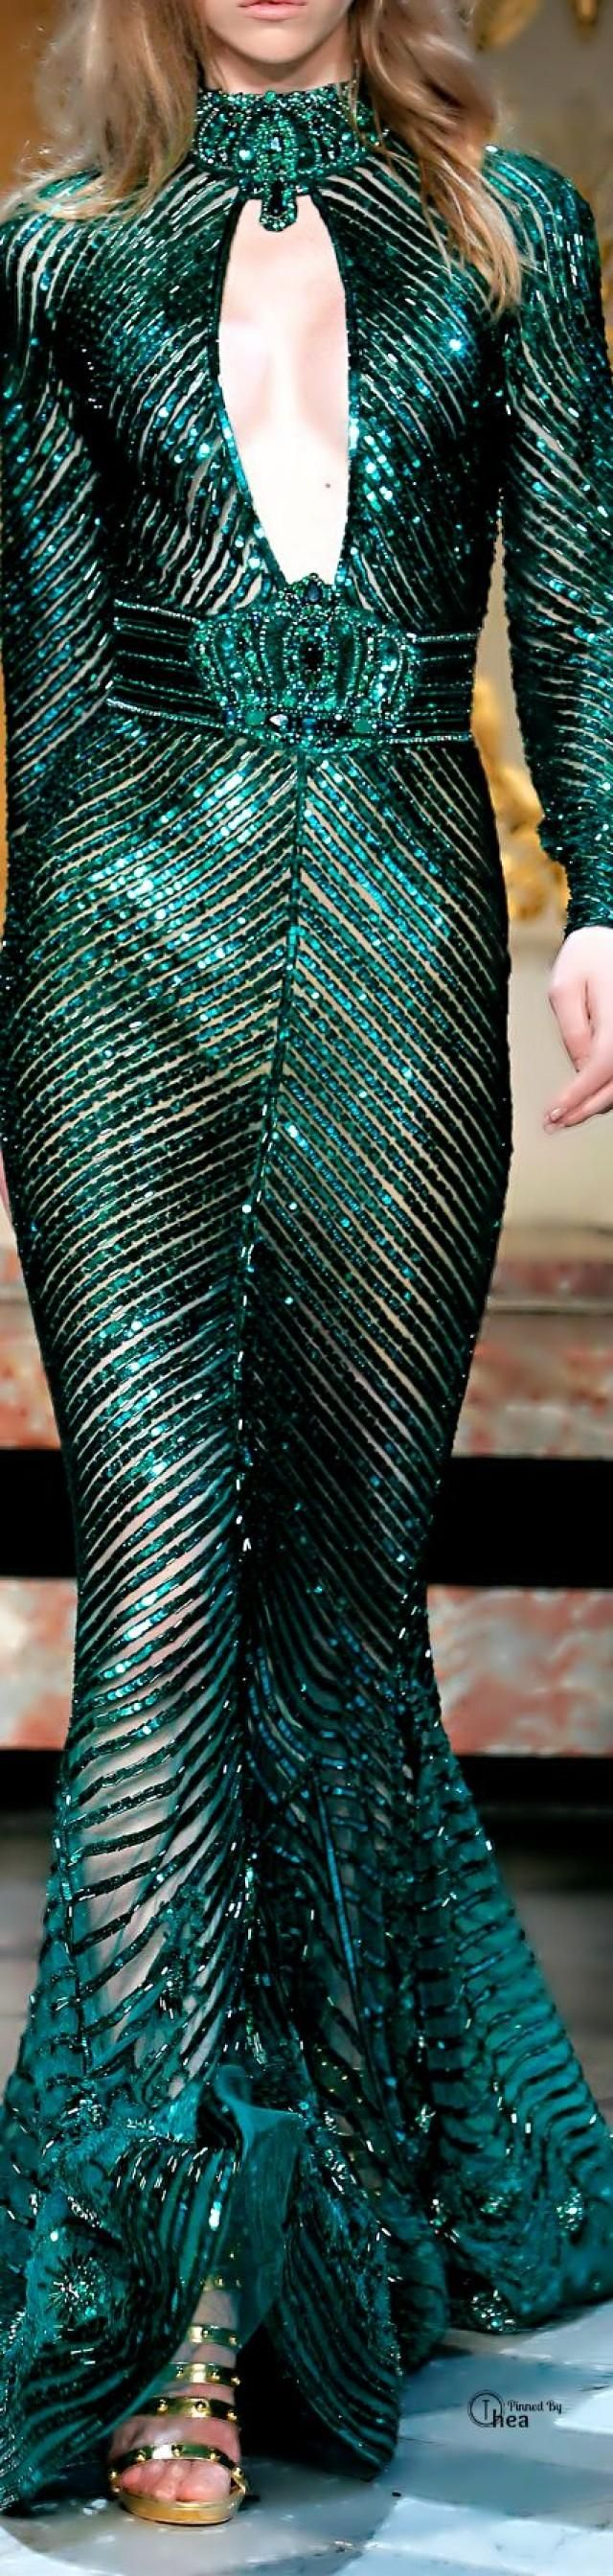 Zuhair Murad Haute Couture green